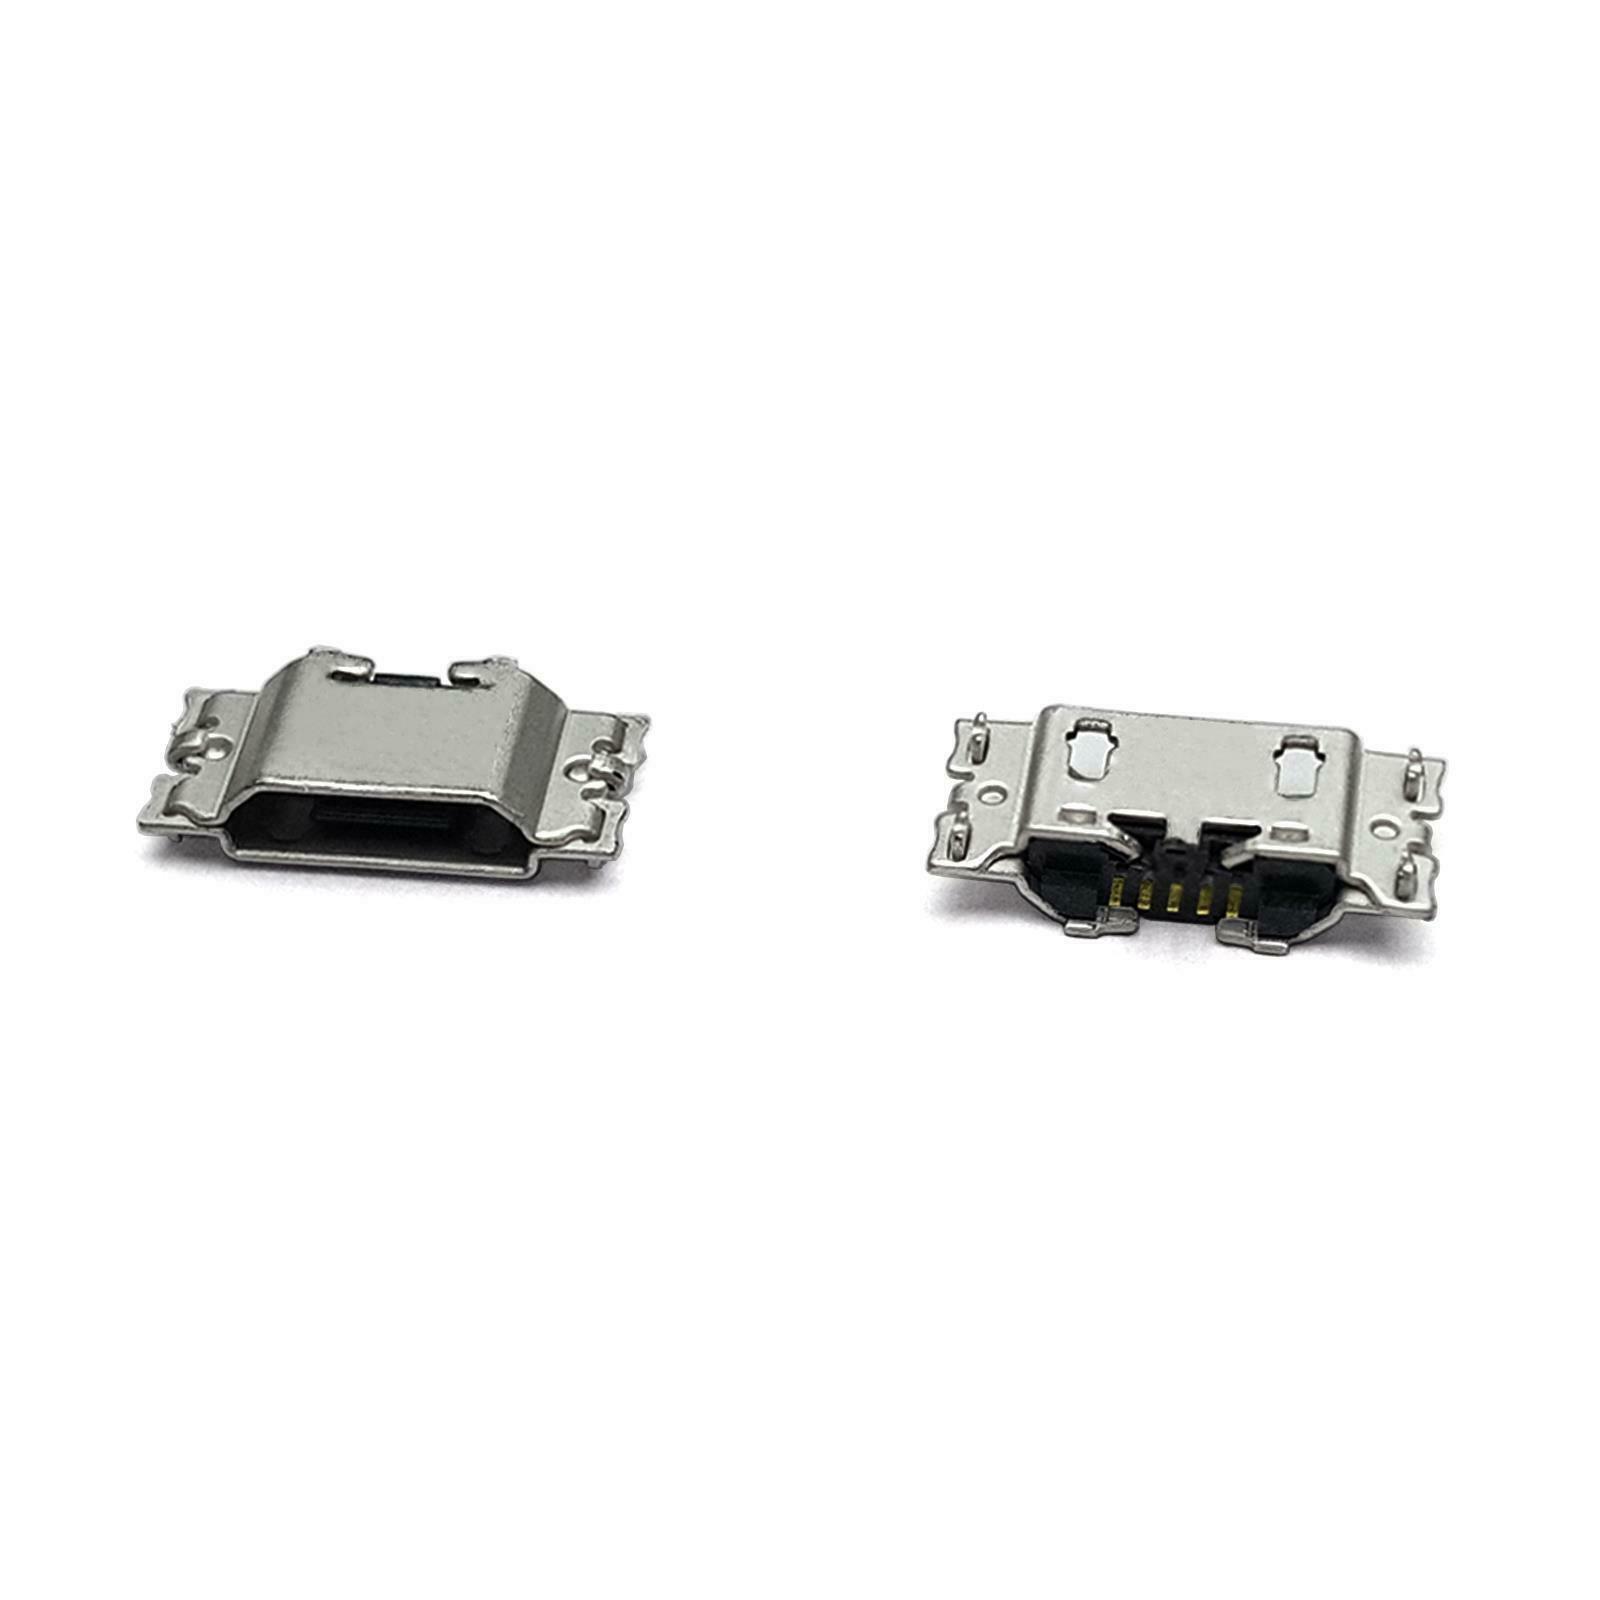 Conector Carga Motorola Moto G5 Plus G5s Plus XT1681 XT1683 XT1802 XT1806